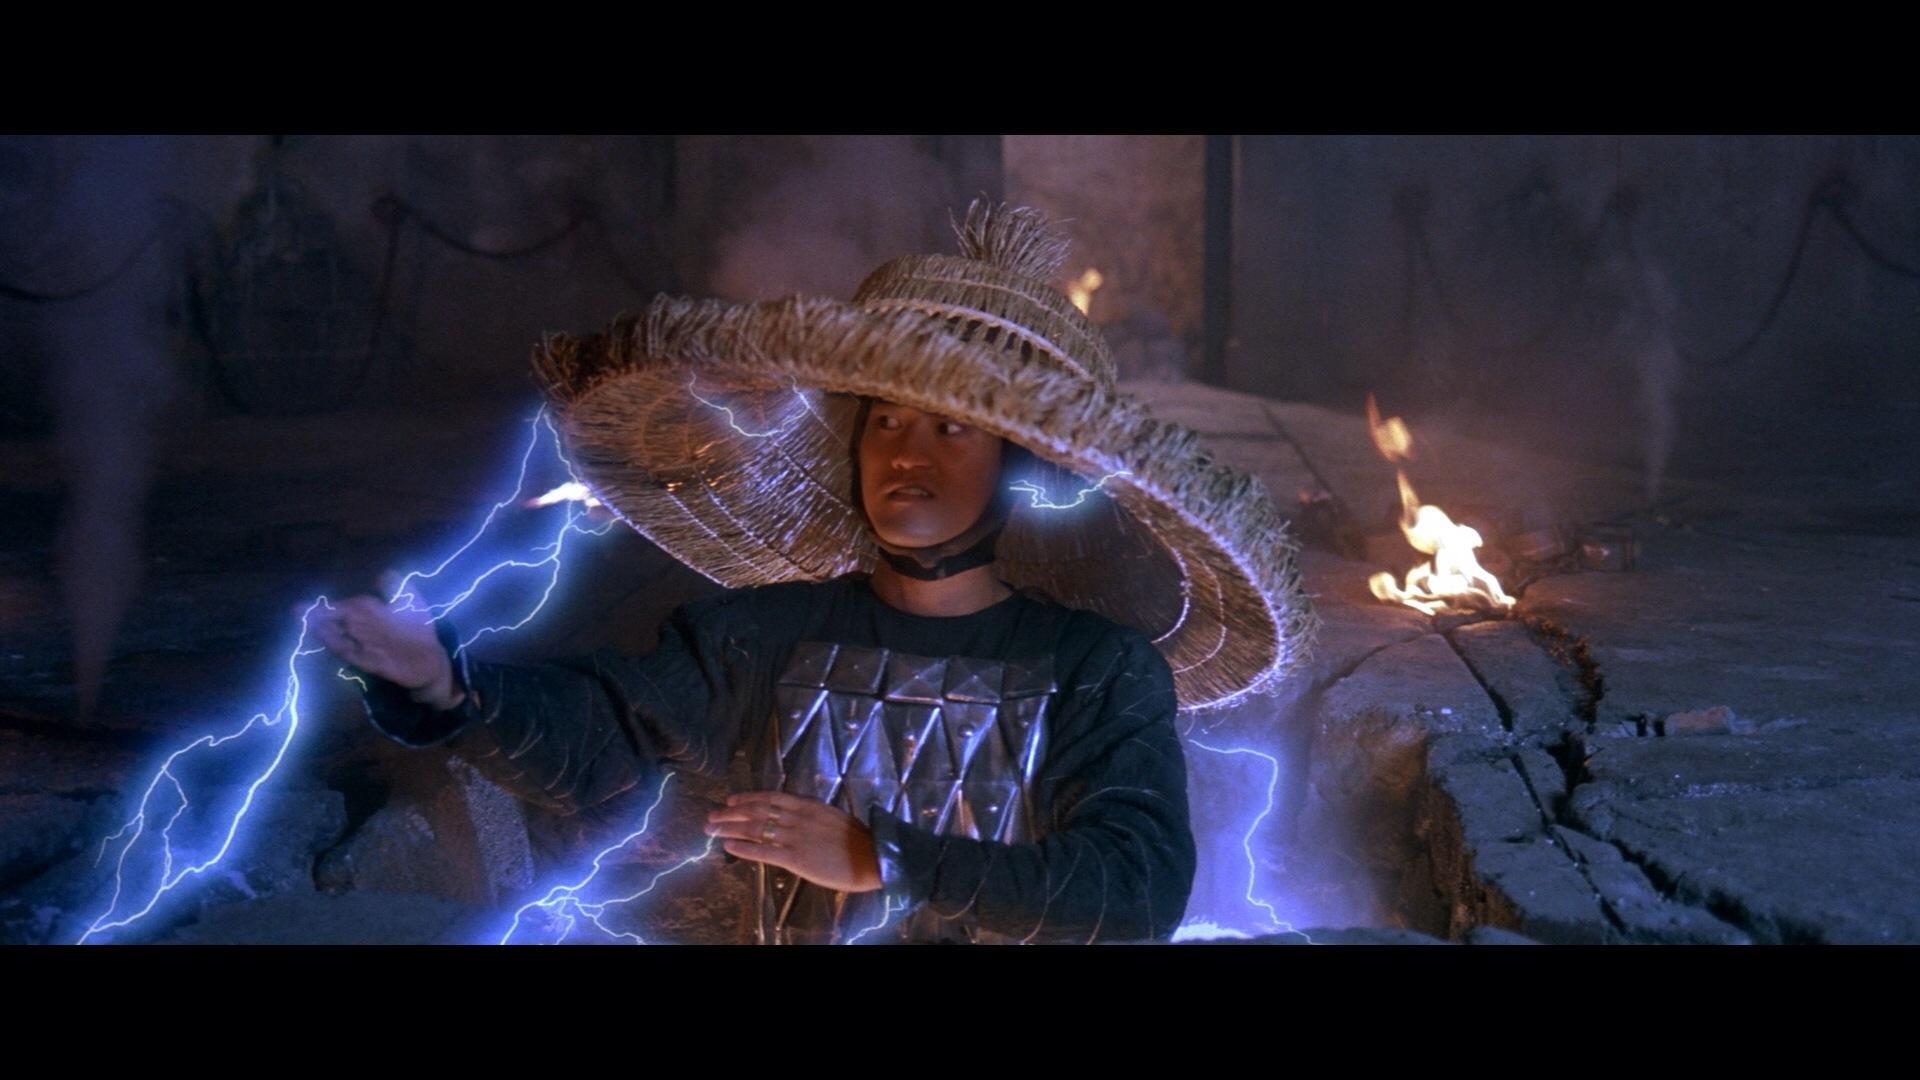 Big Trouble In Little China John Carpenter 1986 Cinema Etc